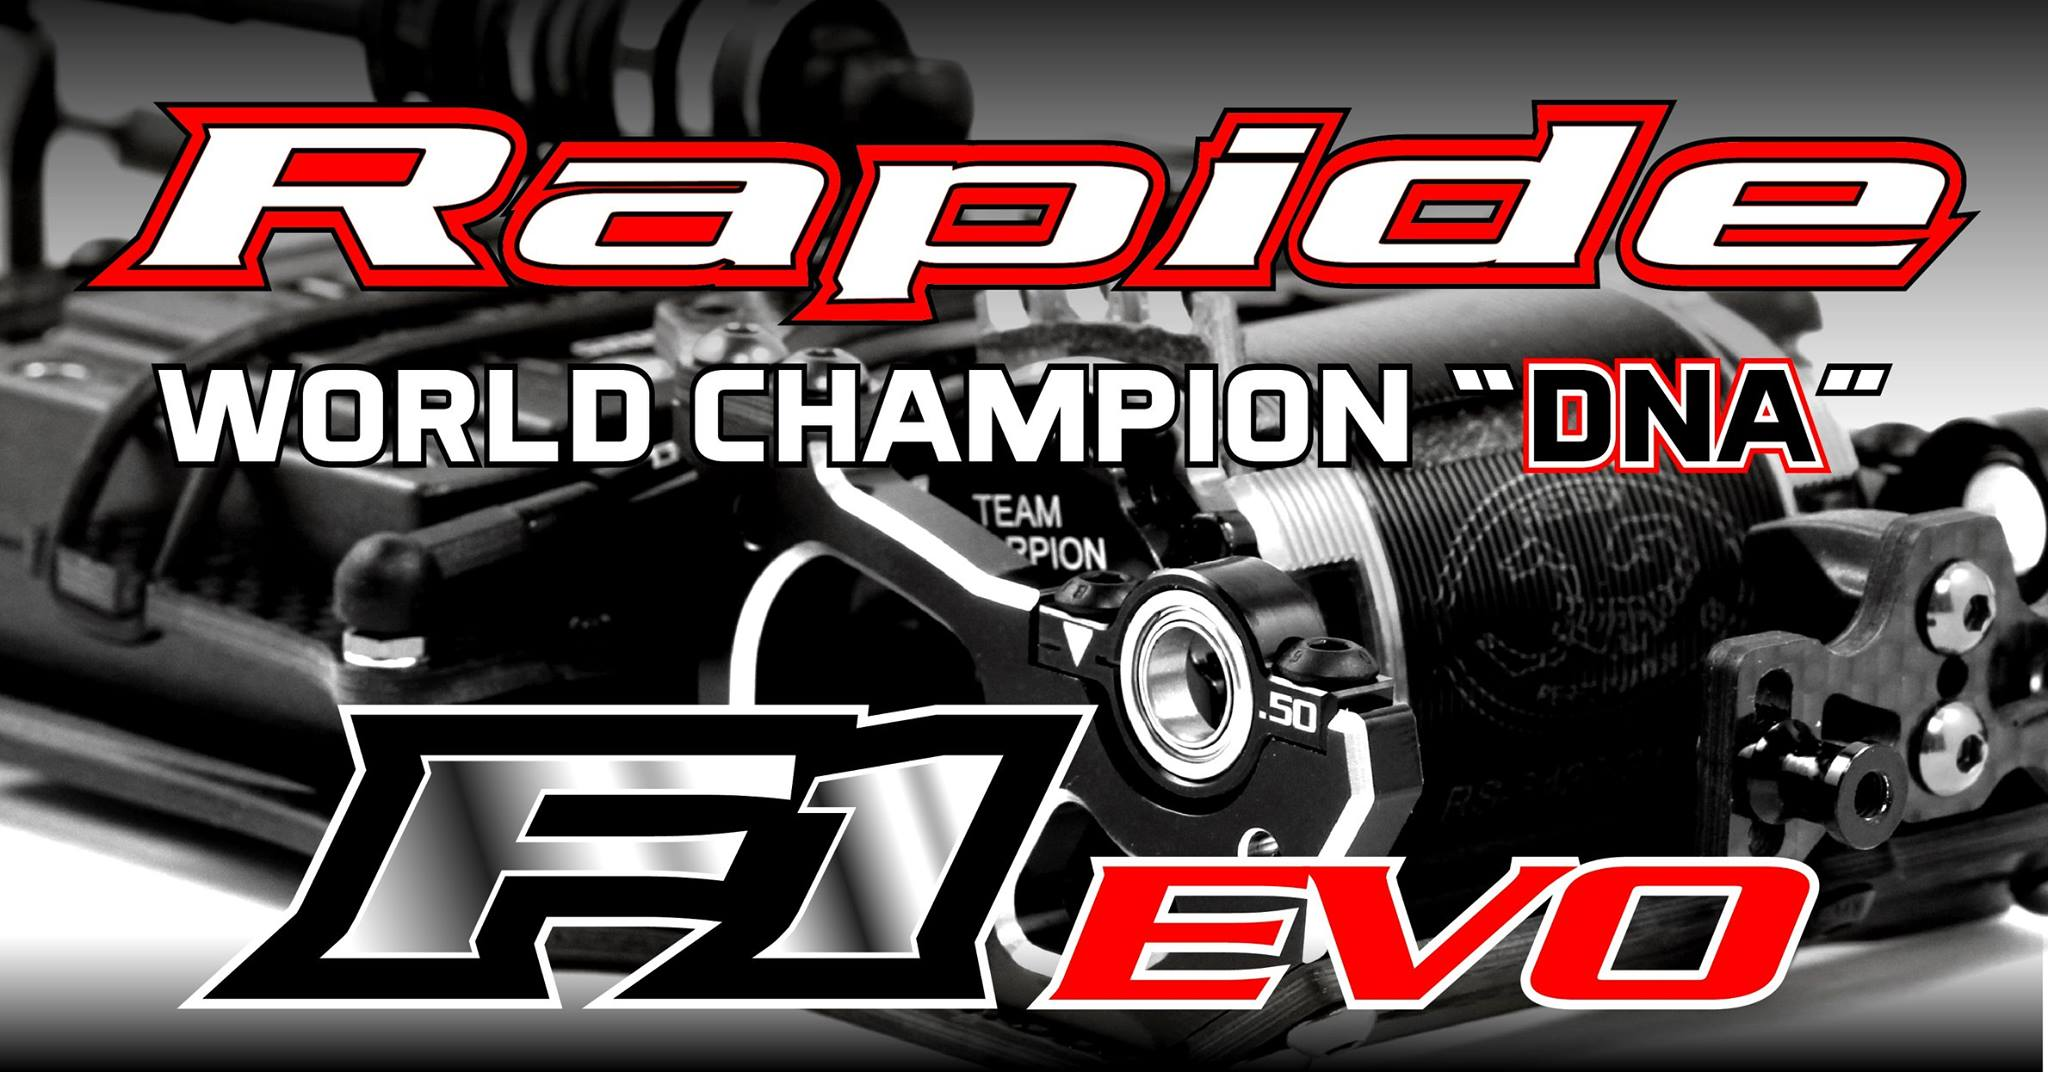 Roche Rapide F1 Setup Sheets